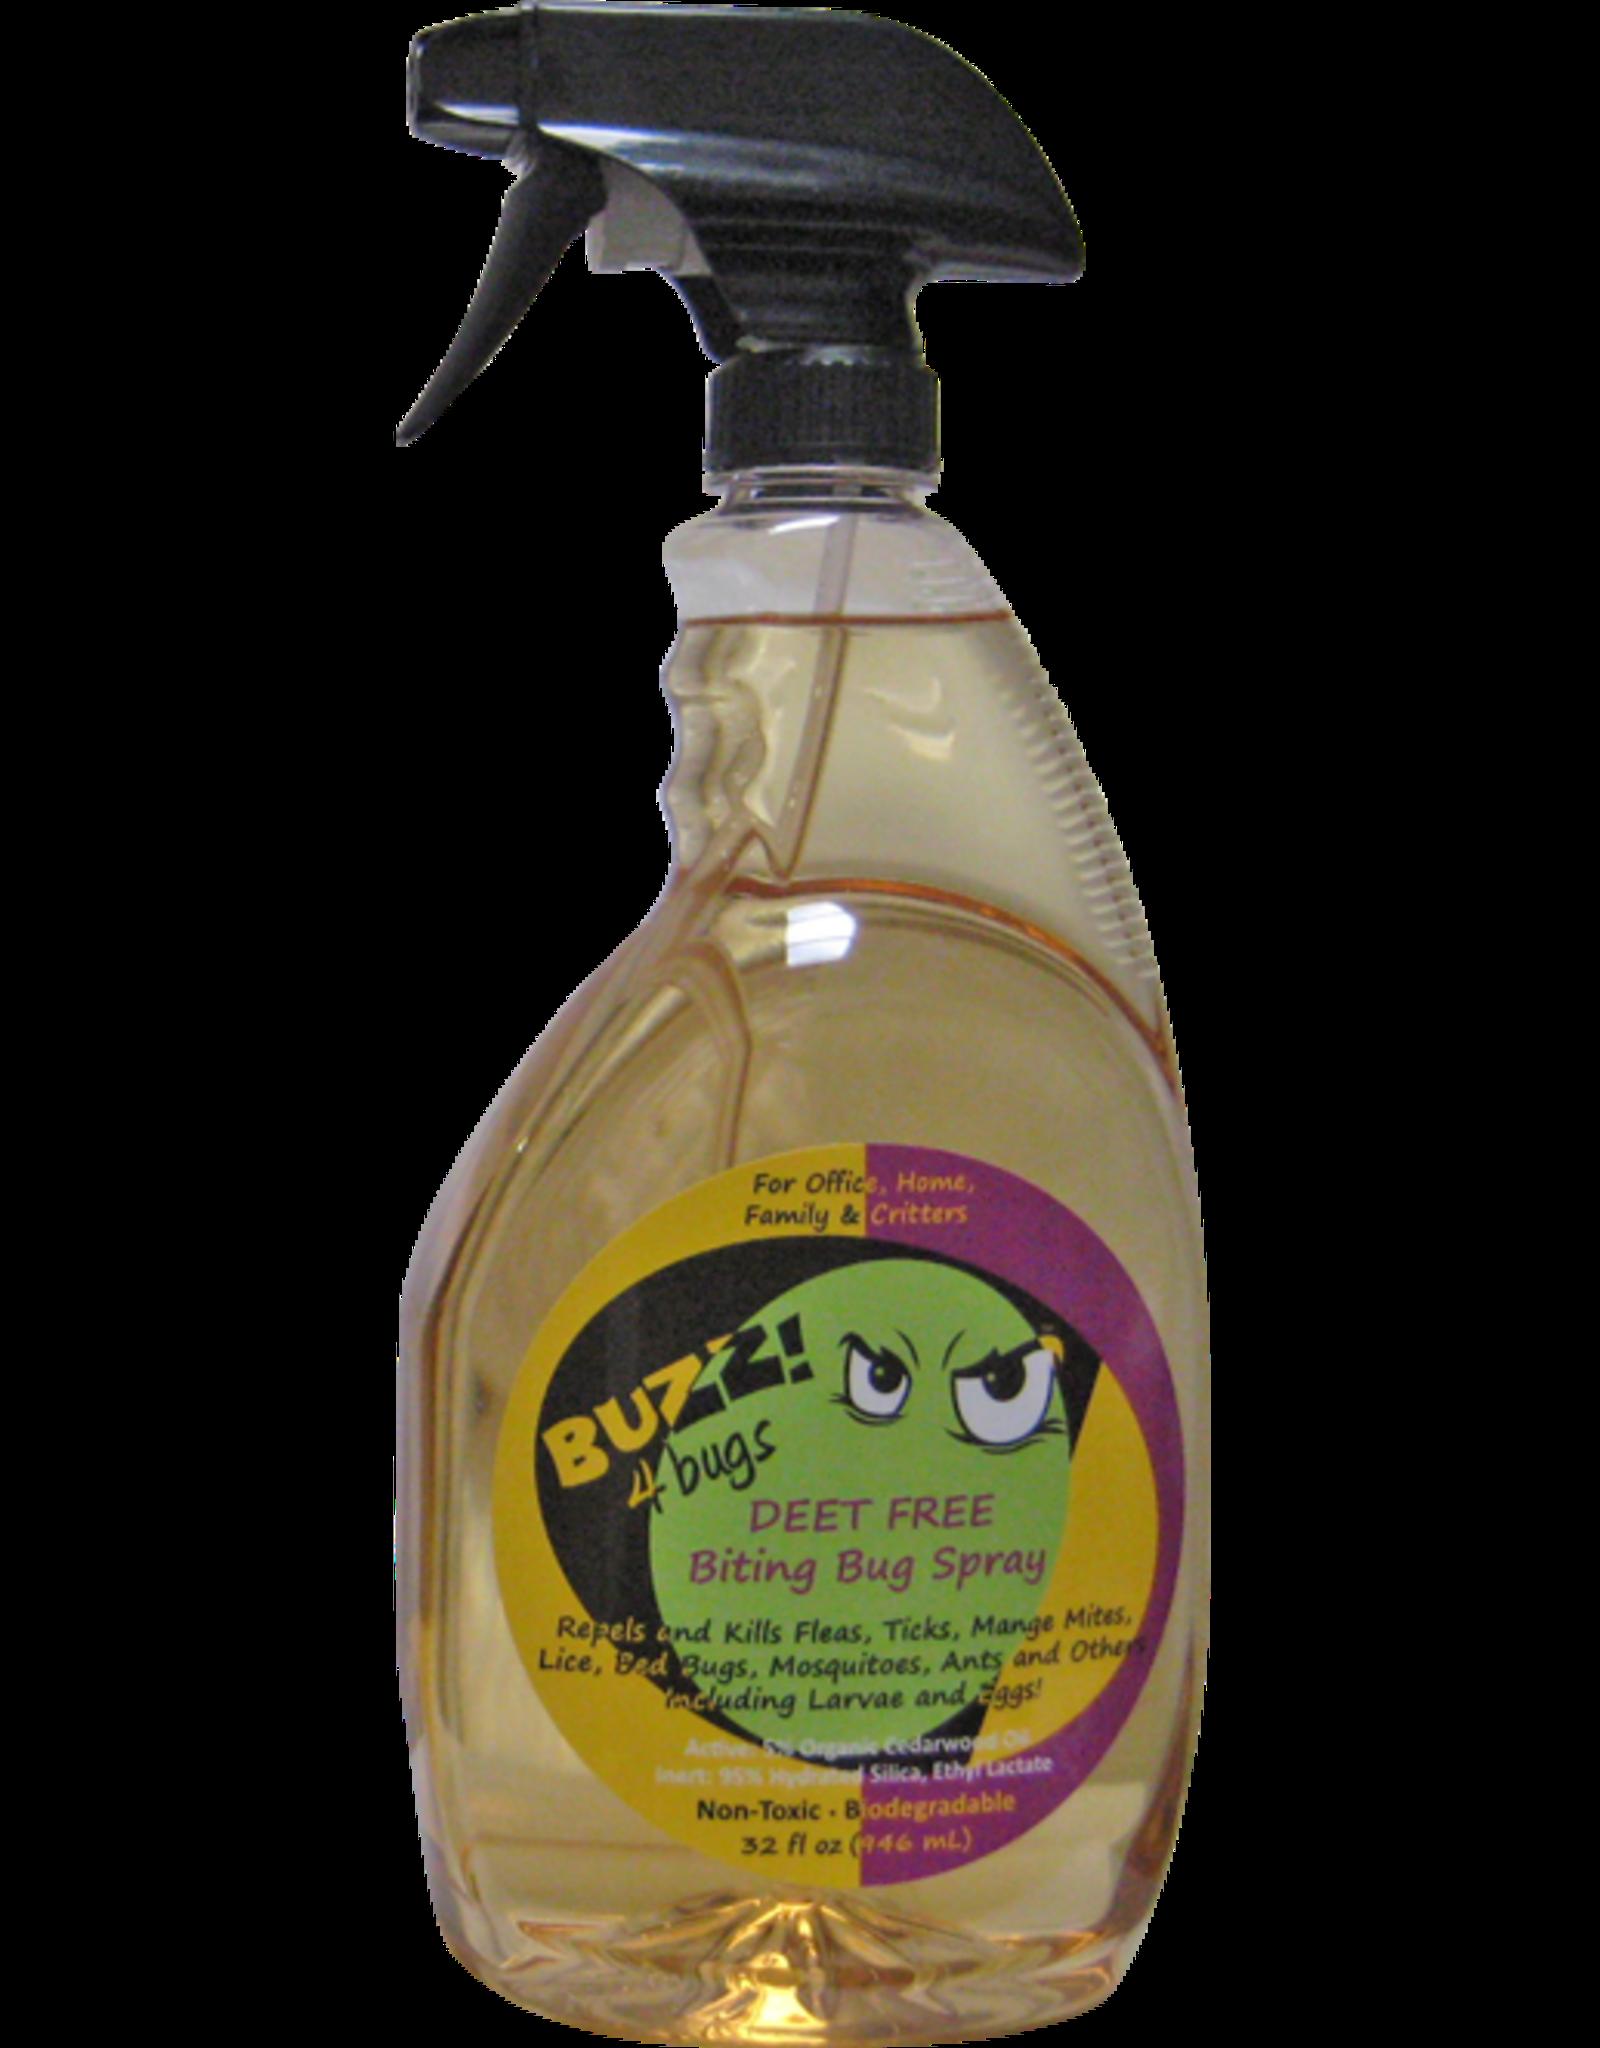 Buzz! 4 Bugs BUZZ! 4 BUGS DEET FREE BITING BUG SPRAY